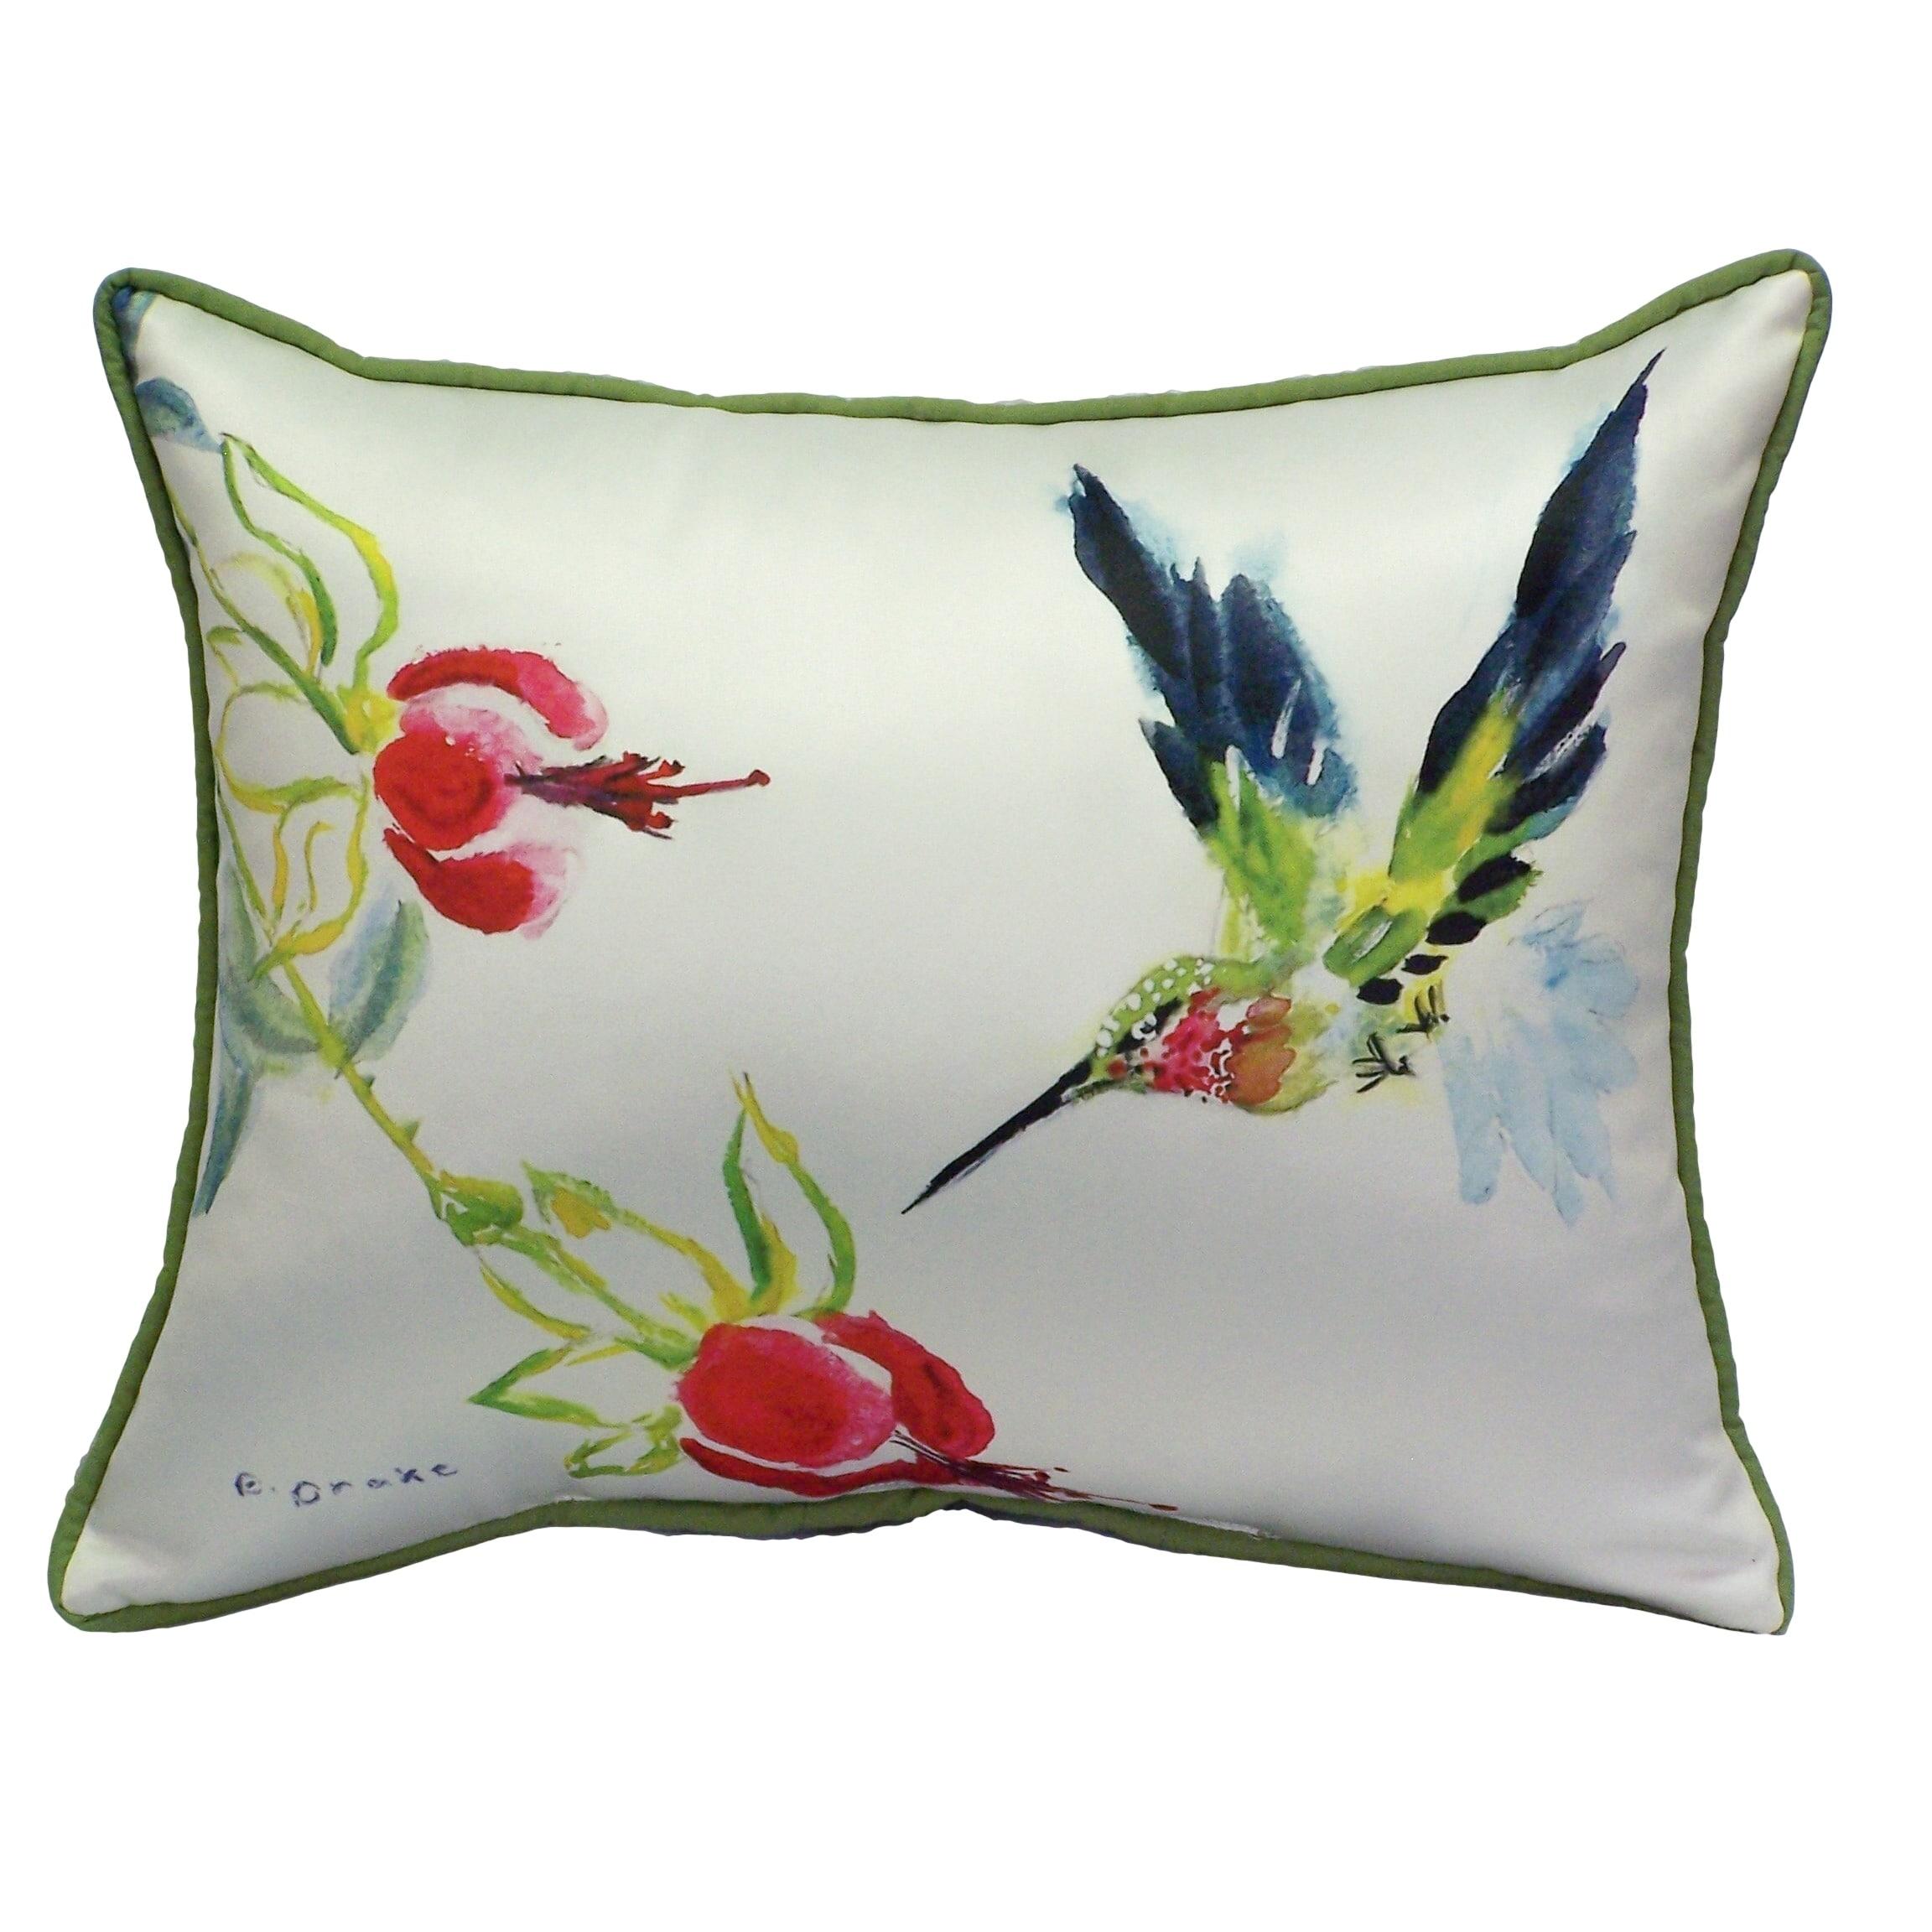 Betsy Drake Betsy's Hummingbird 16x20-inch Indoor/Outdoor...